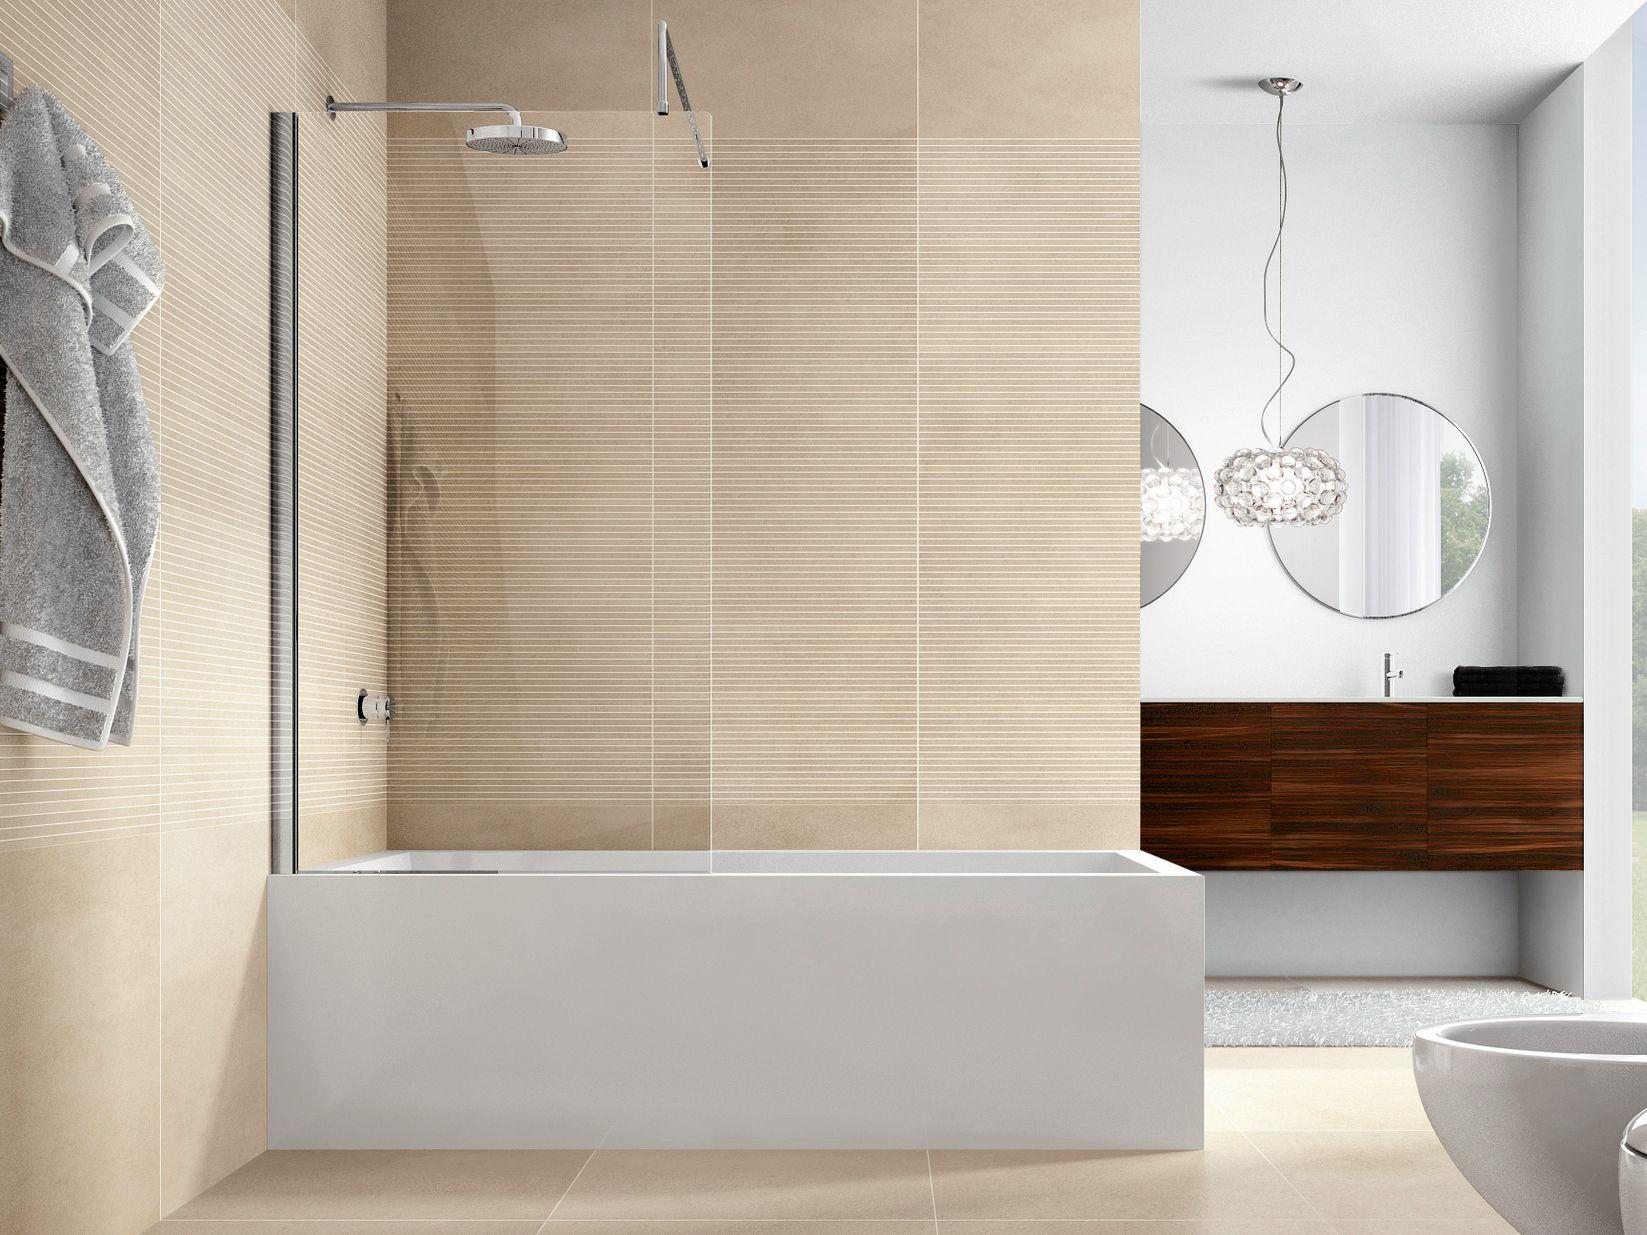 VELA Bathtub wall panel by IdeaGroup   Bathrooms   Pinterest ...